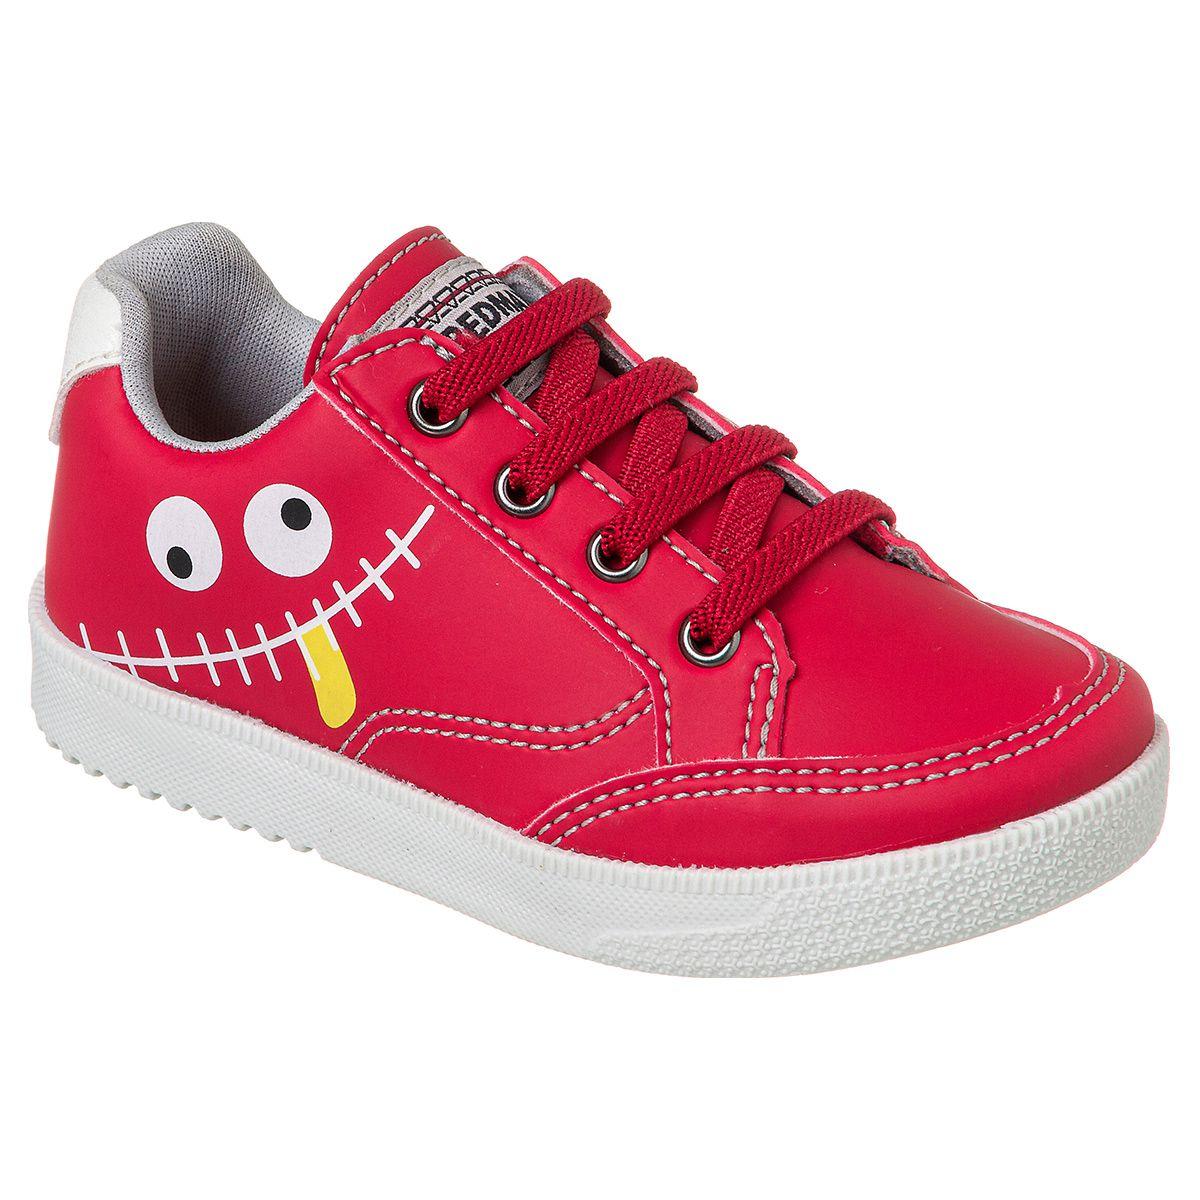 Sapatênis Infantil Menino - Vermelho - Vity